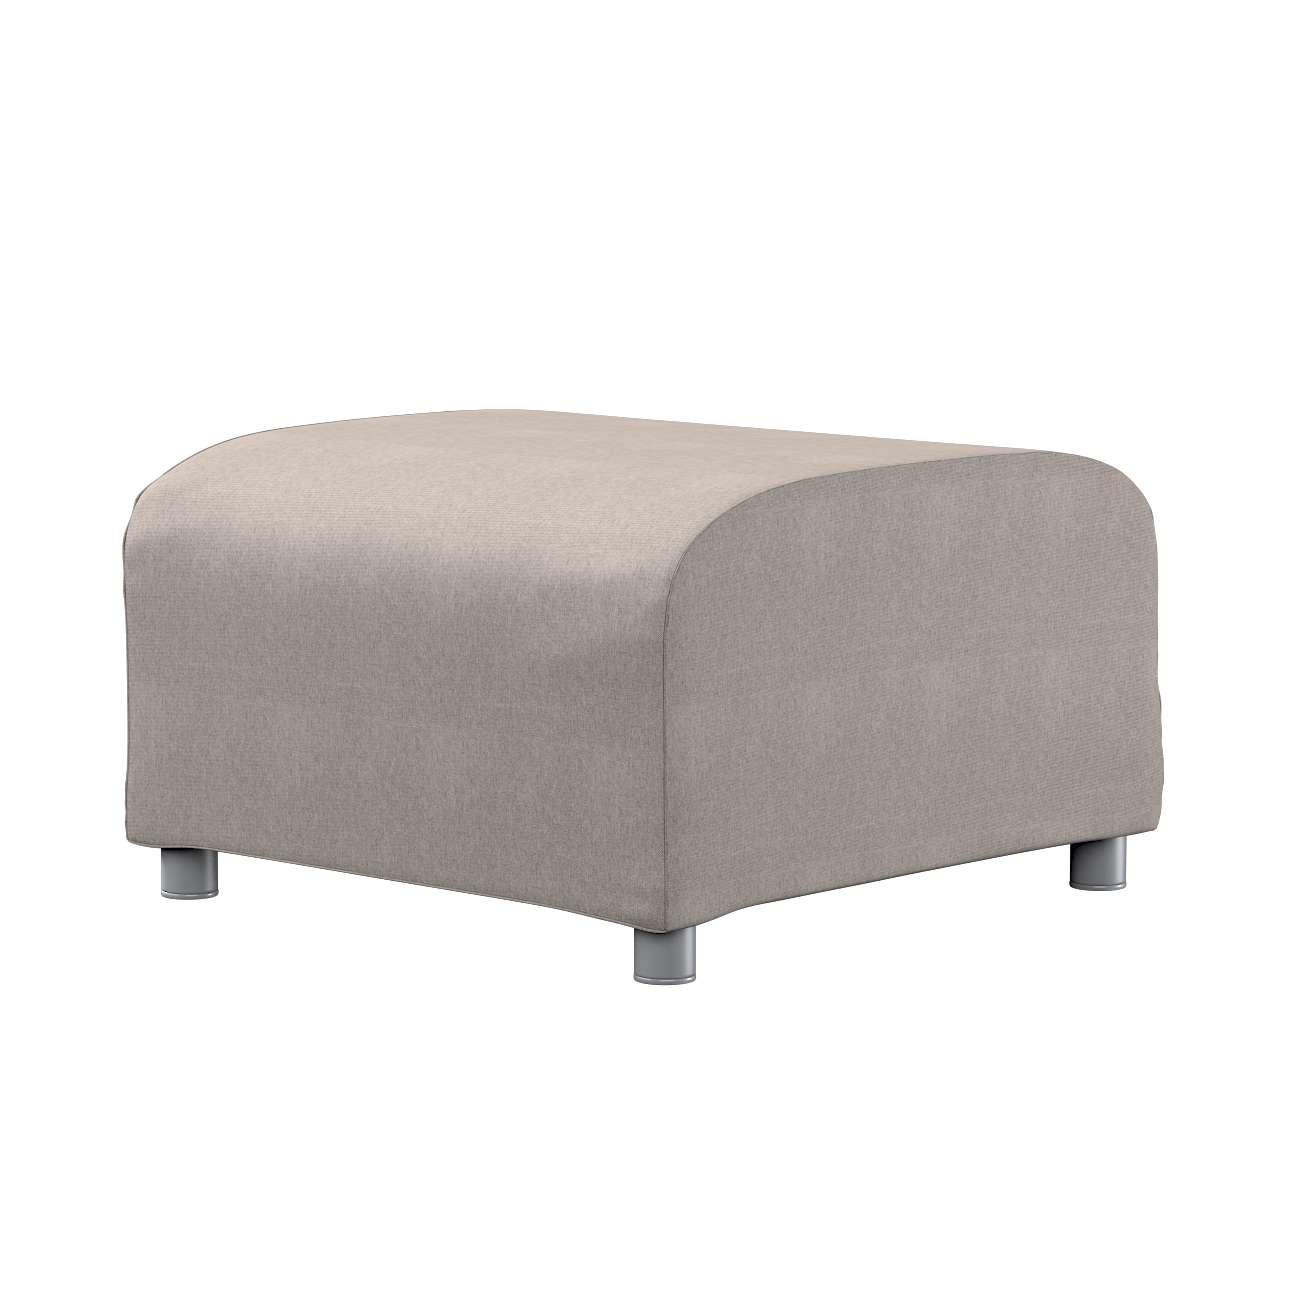 KLIPPAN pufo užvalkalas Klippan footstool cover kolekcijoje Etna , audinys: 705-09